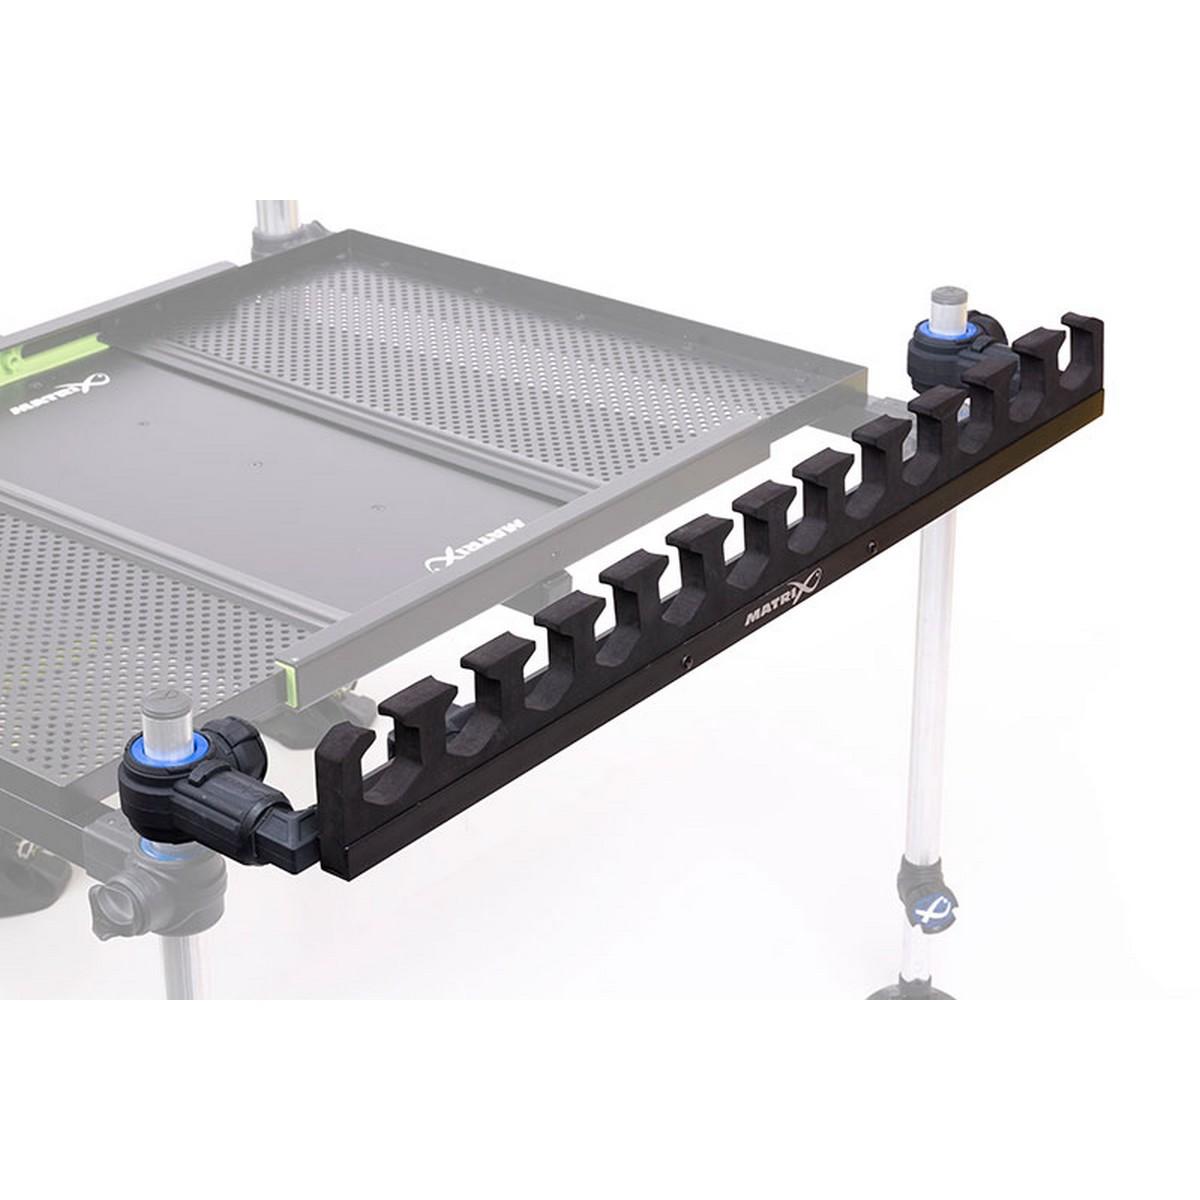 Прикачна за платформа Matrix 3D-R Extending 12 Kit Roost Bar - Опора за топ сет